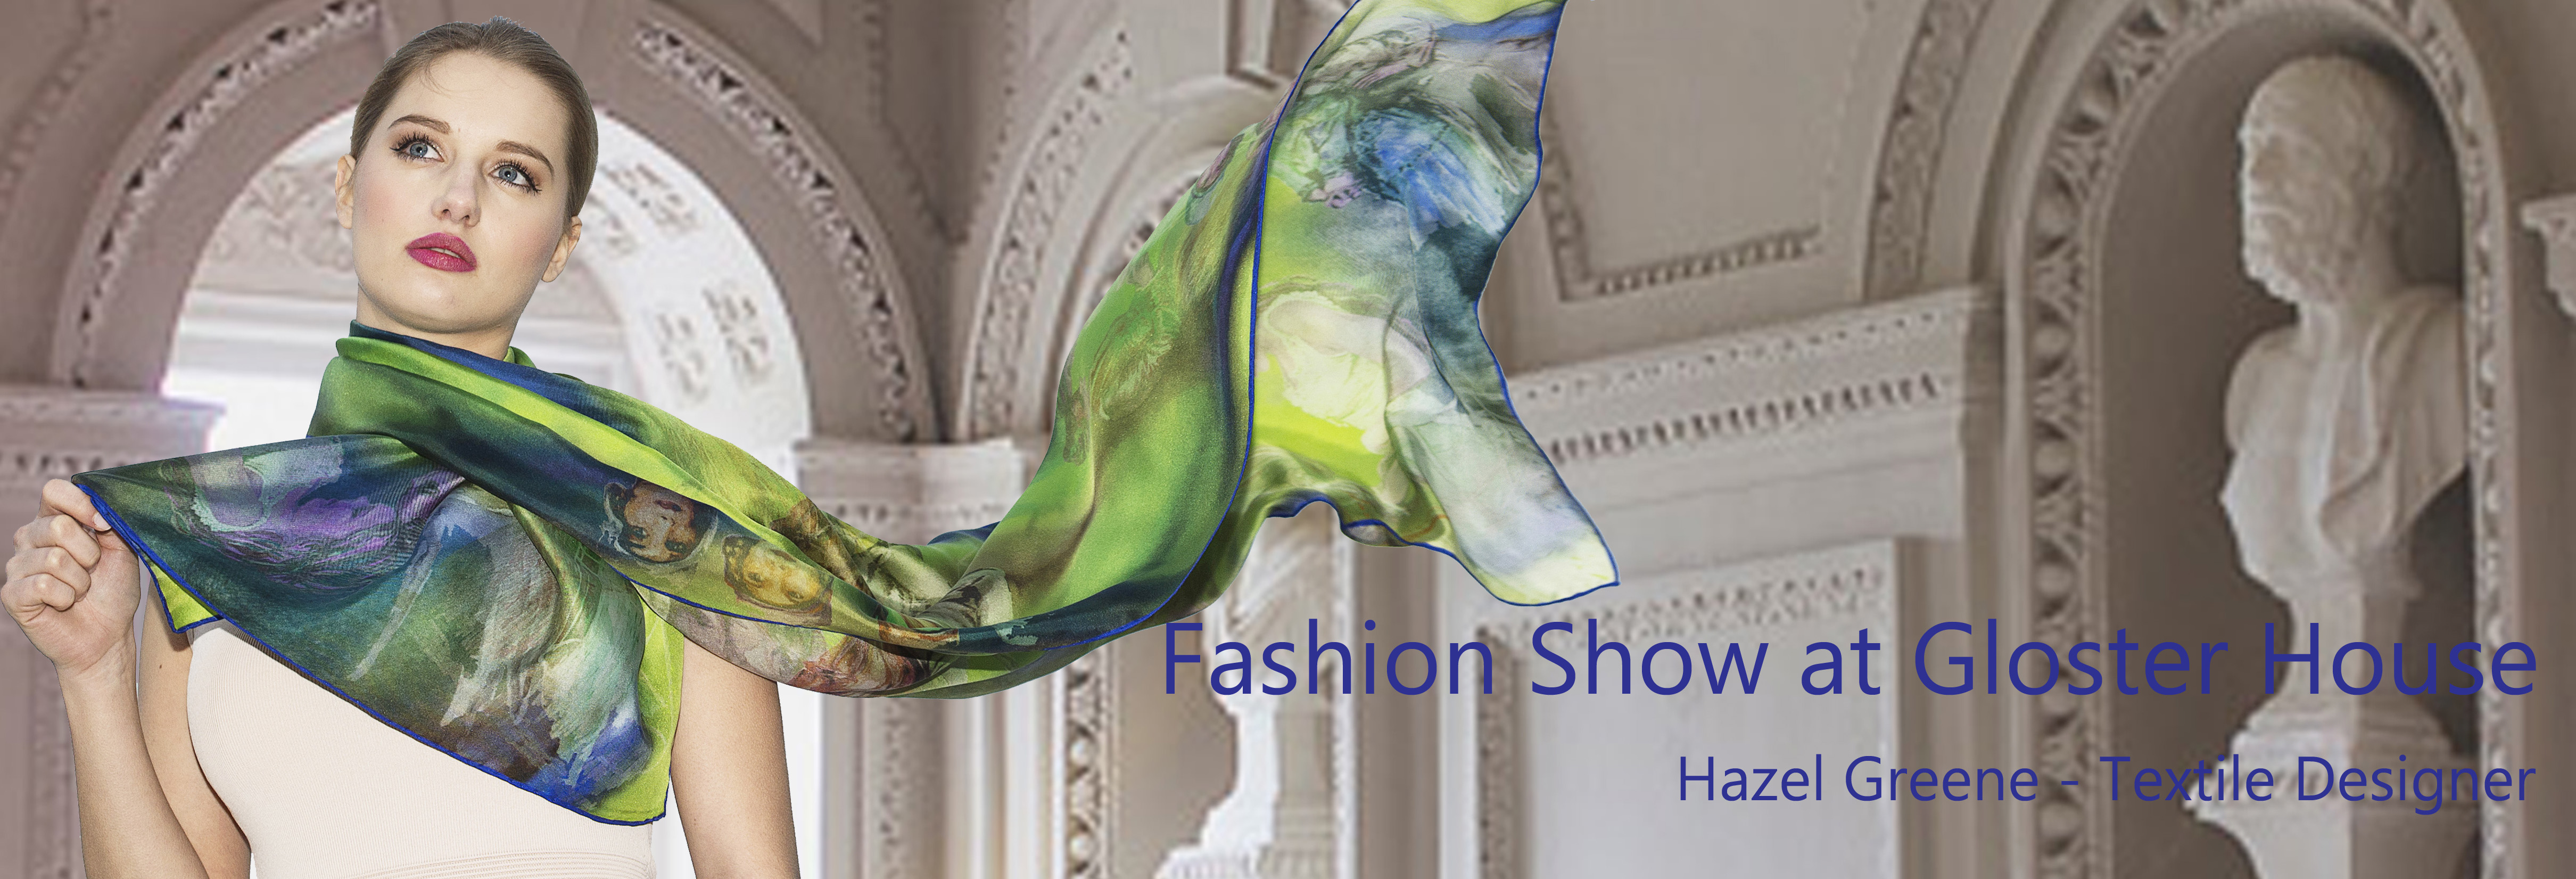 Fashion Show - Hazel